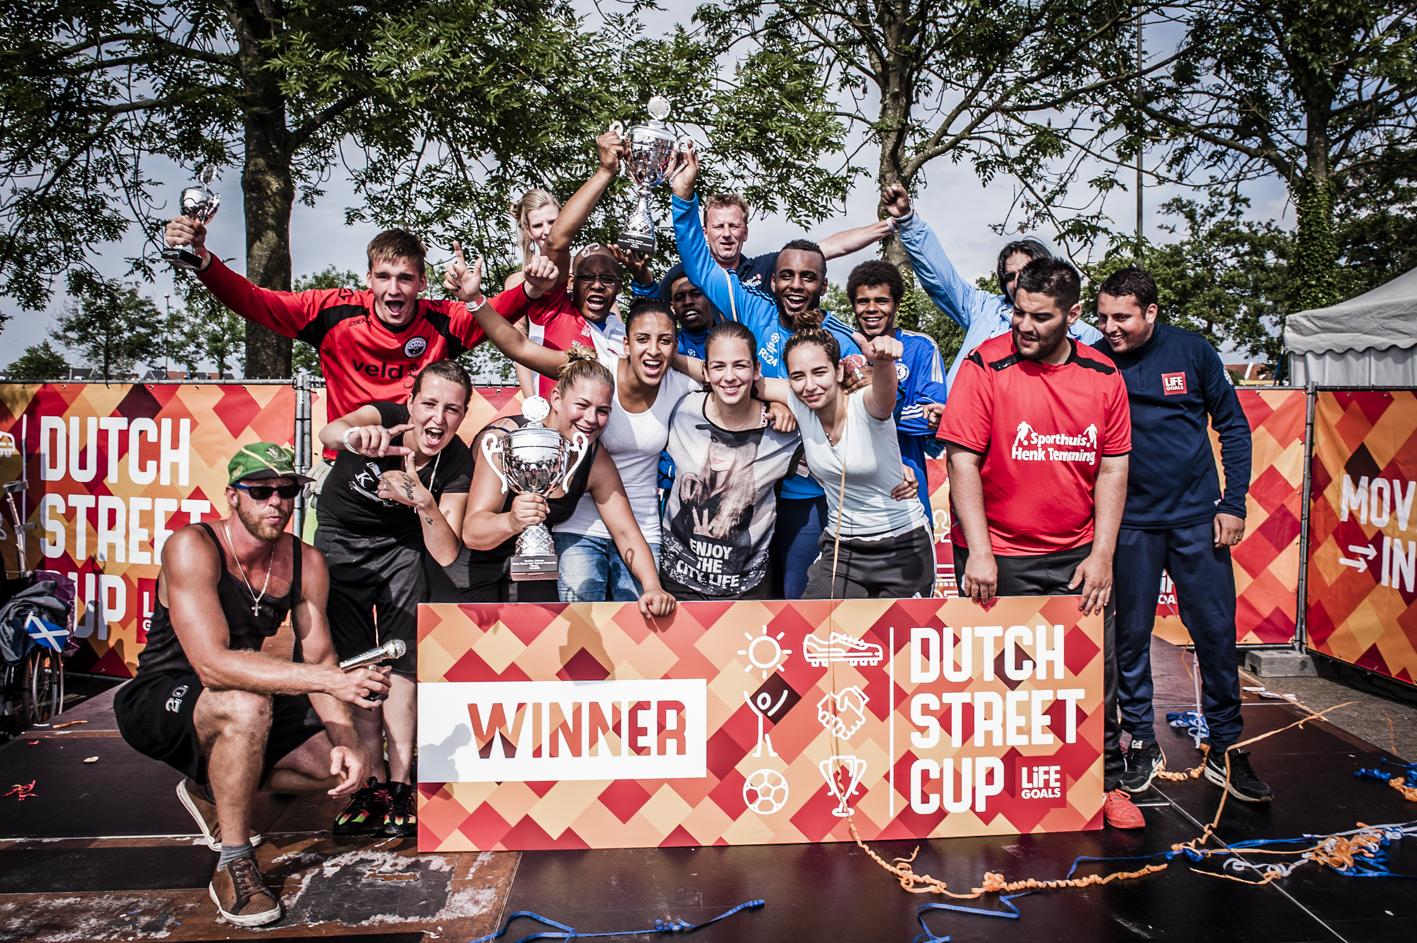 DSC Harderwijk 11-06-2016-707